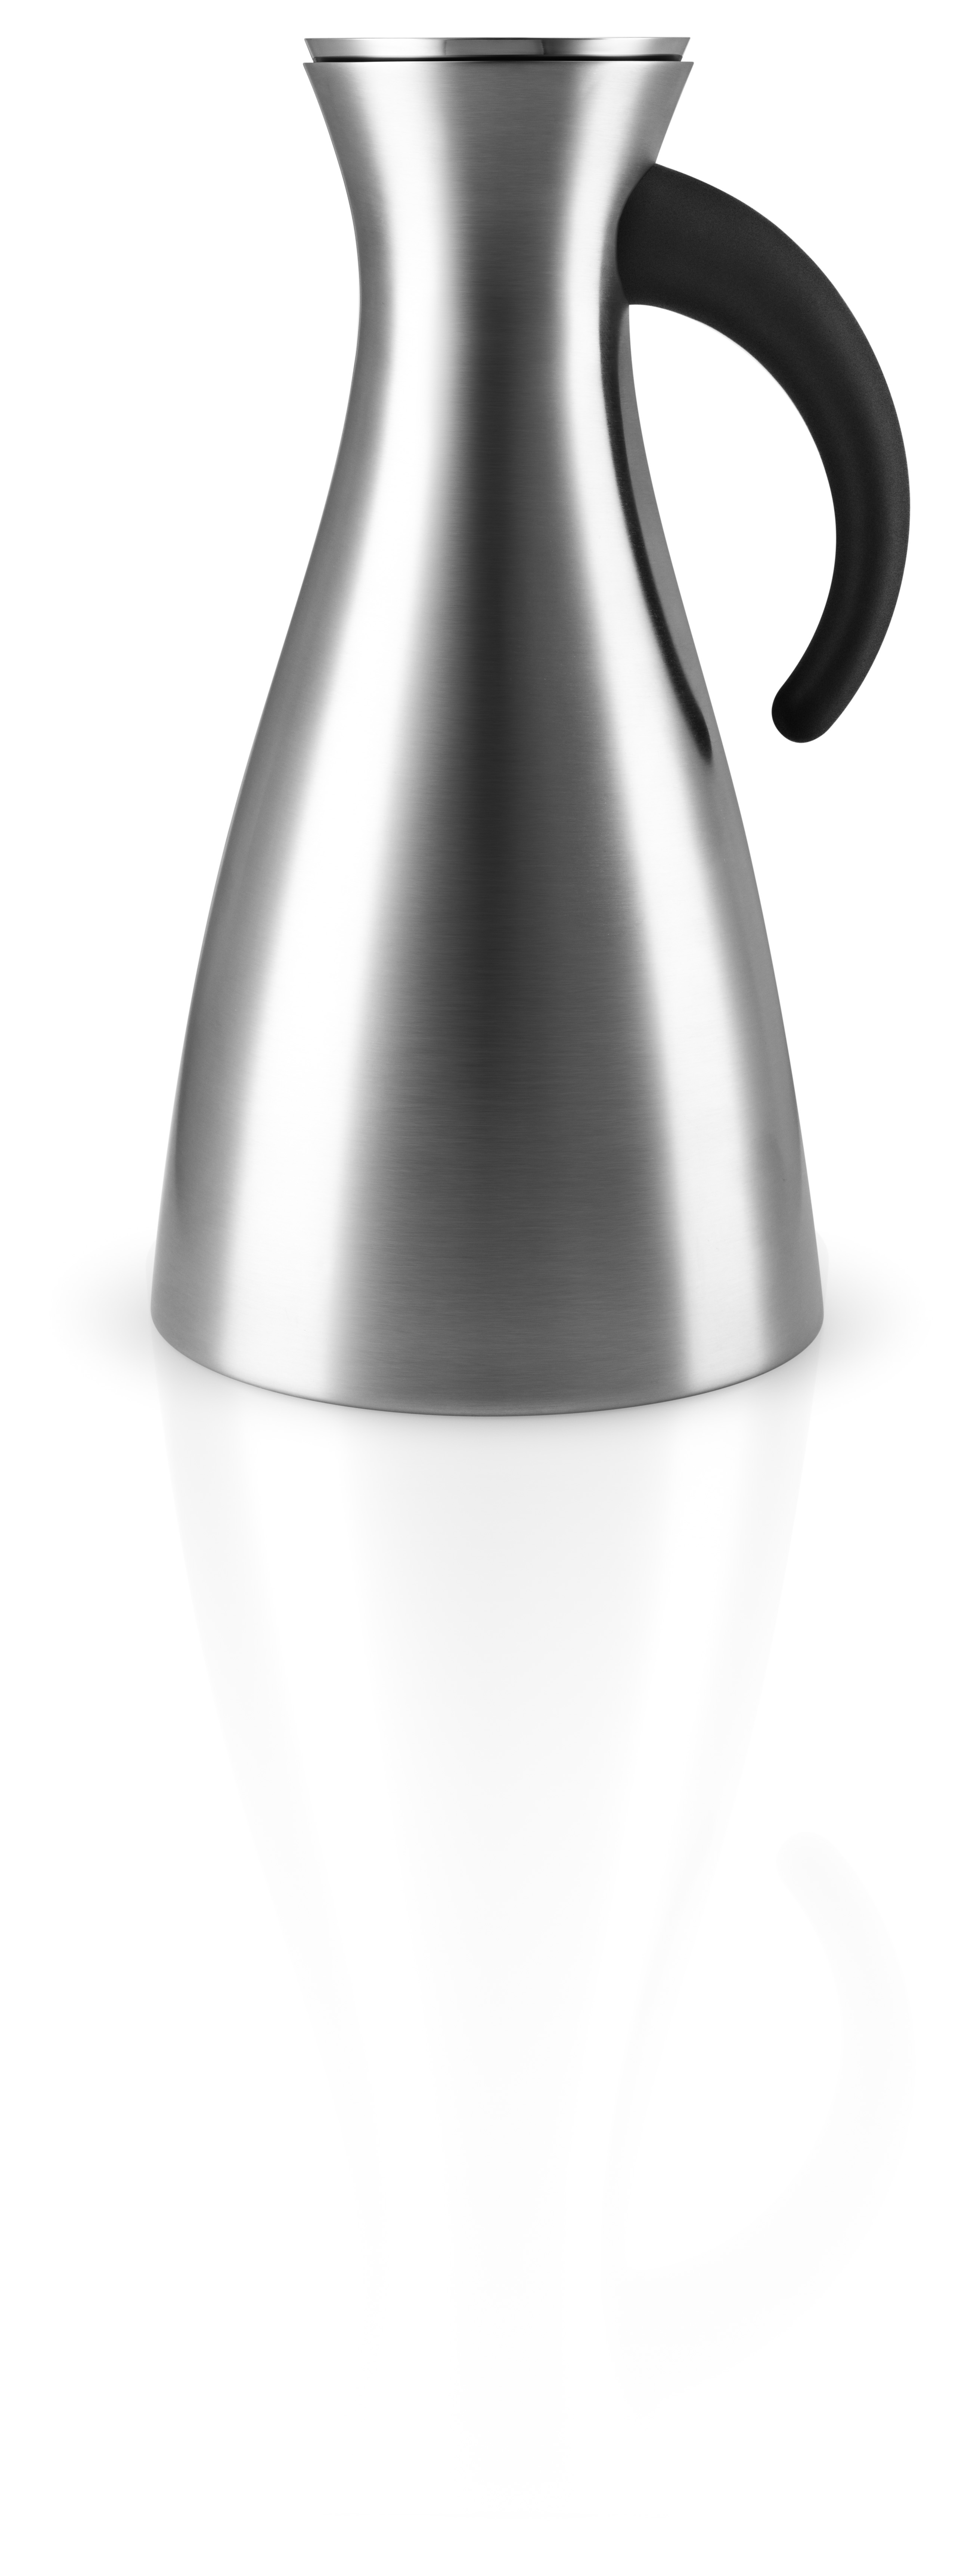 Eva Solo termokande, 1 liter, stainless steel